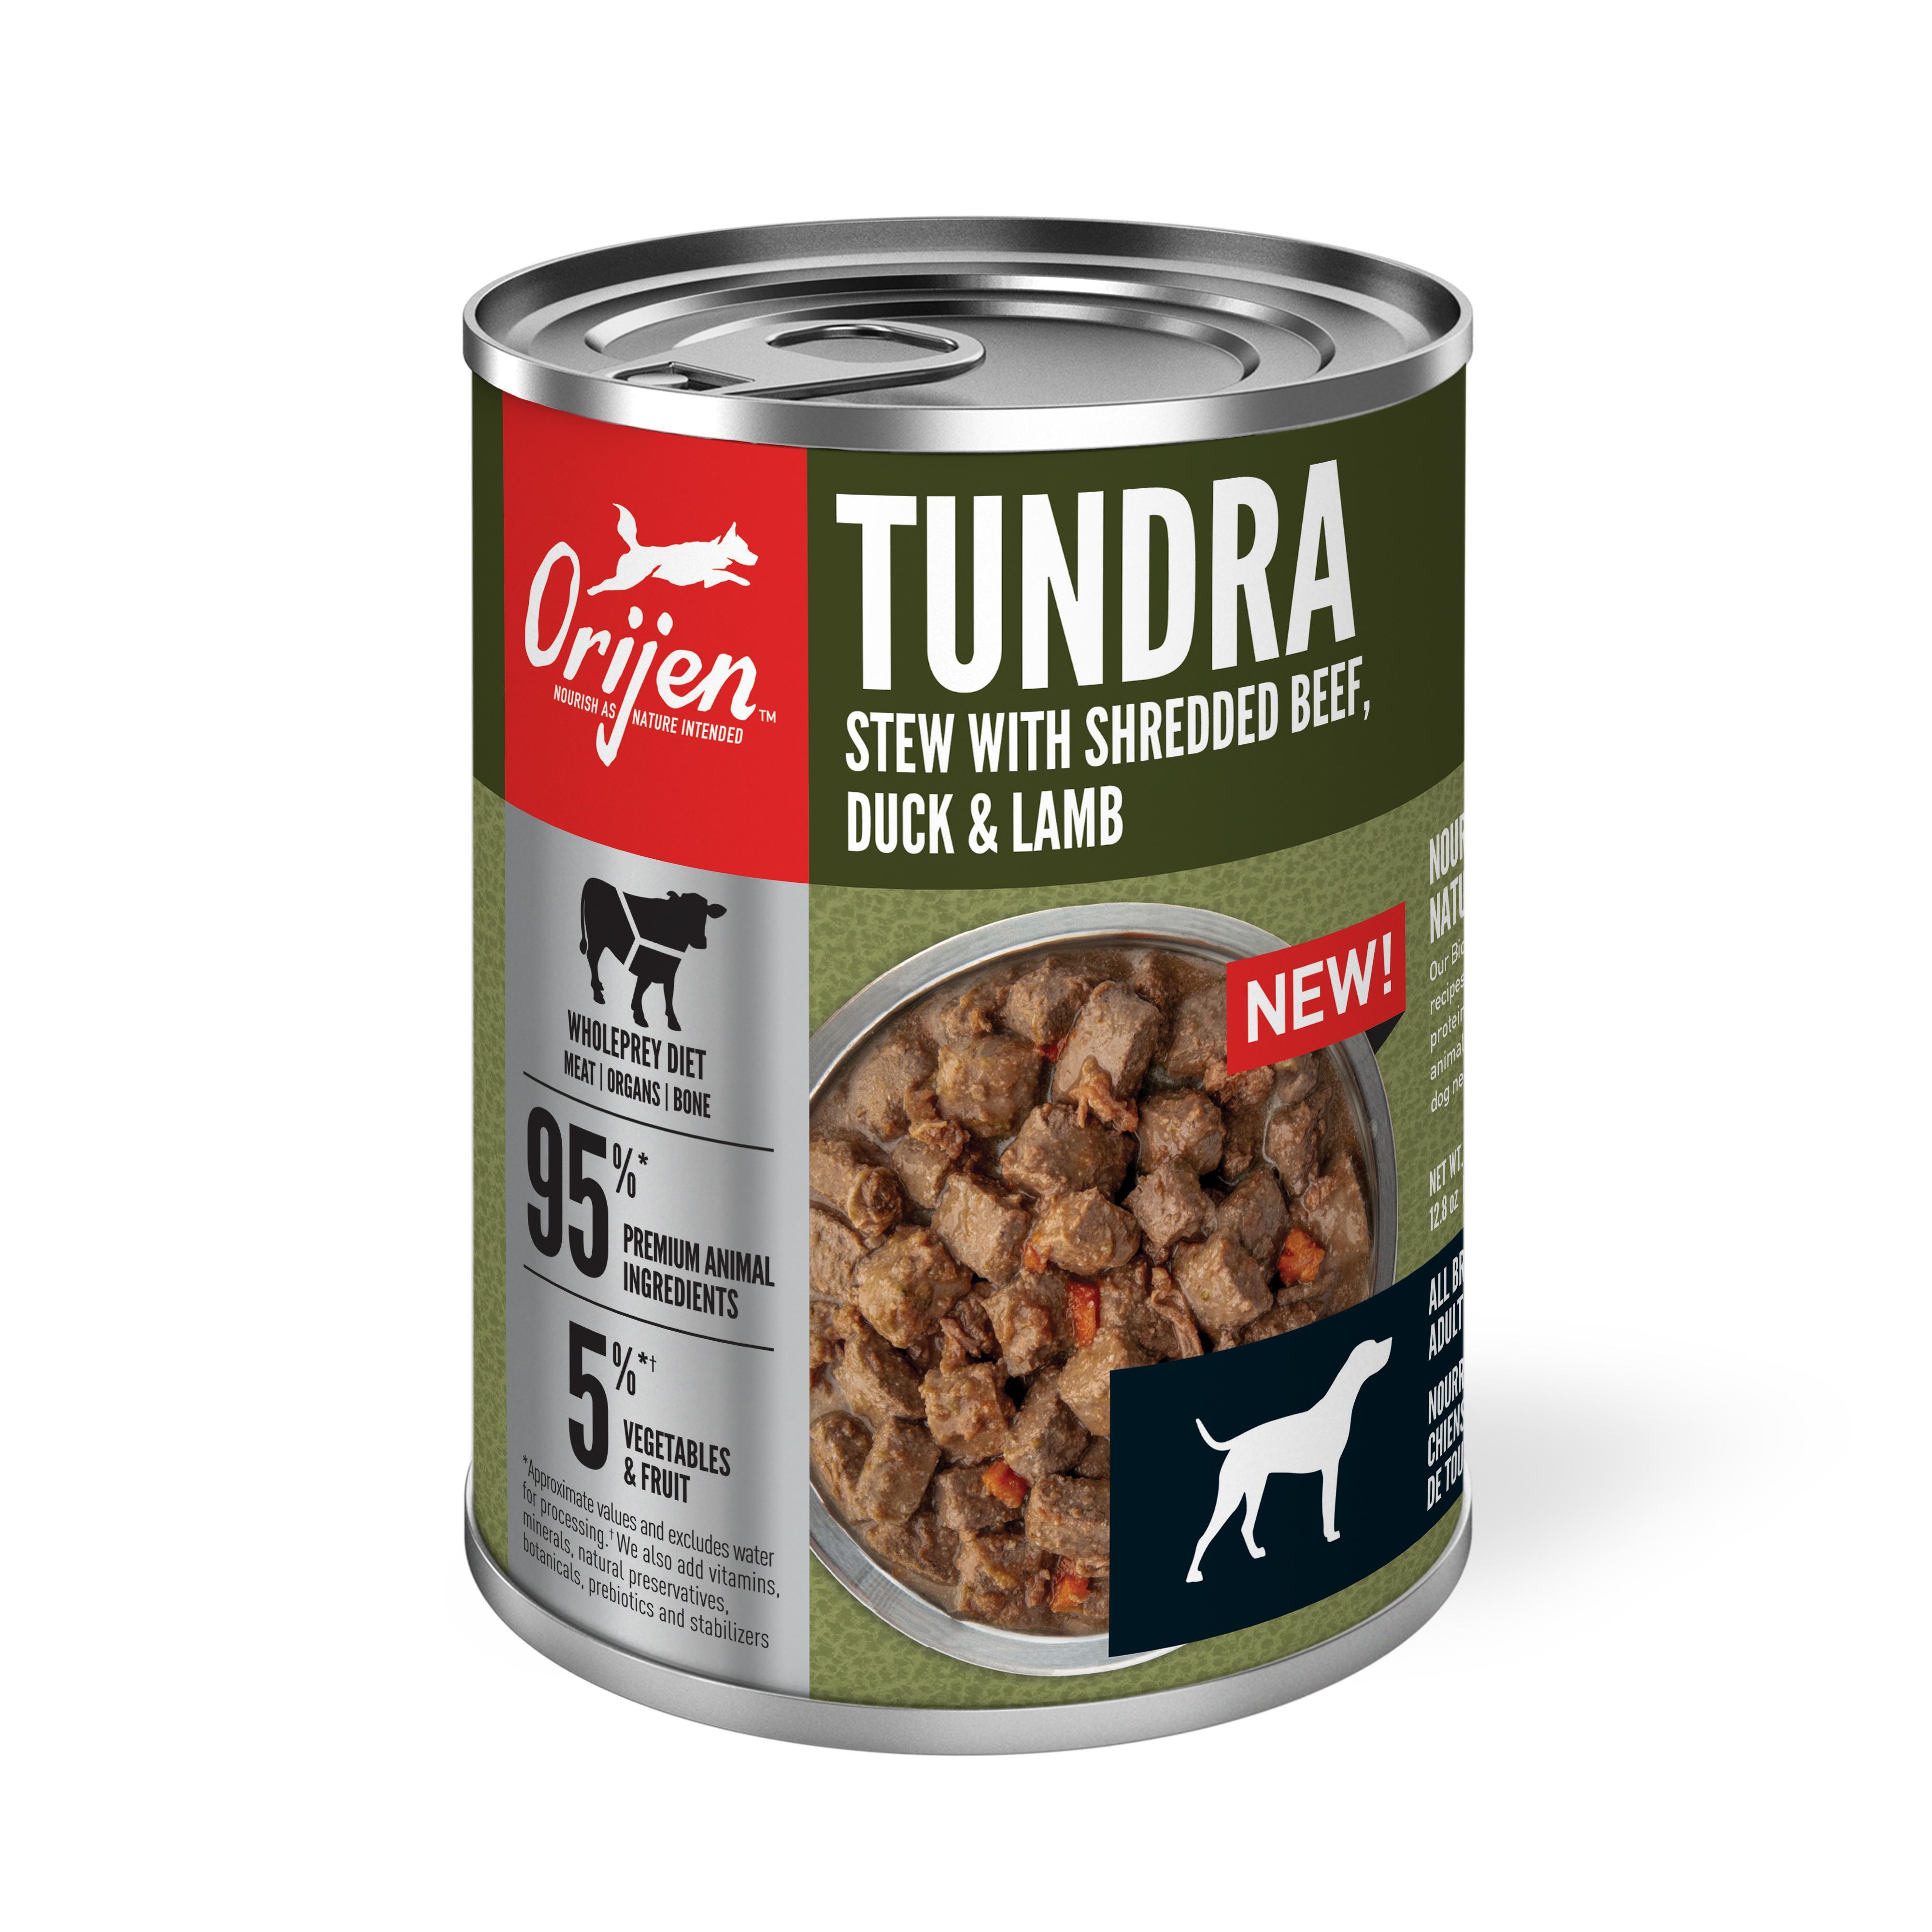 ORIJEN Tundra Stew with Shredded Beef, Duck & Lamb Wet Dog Food Image